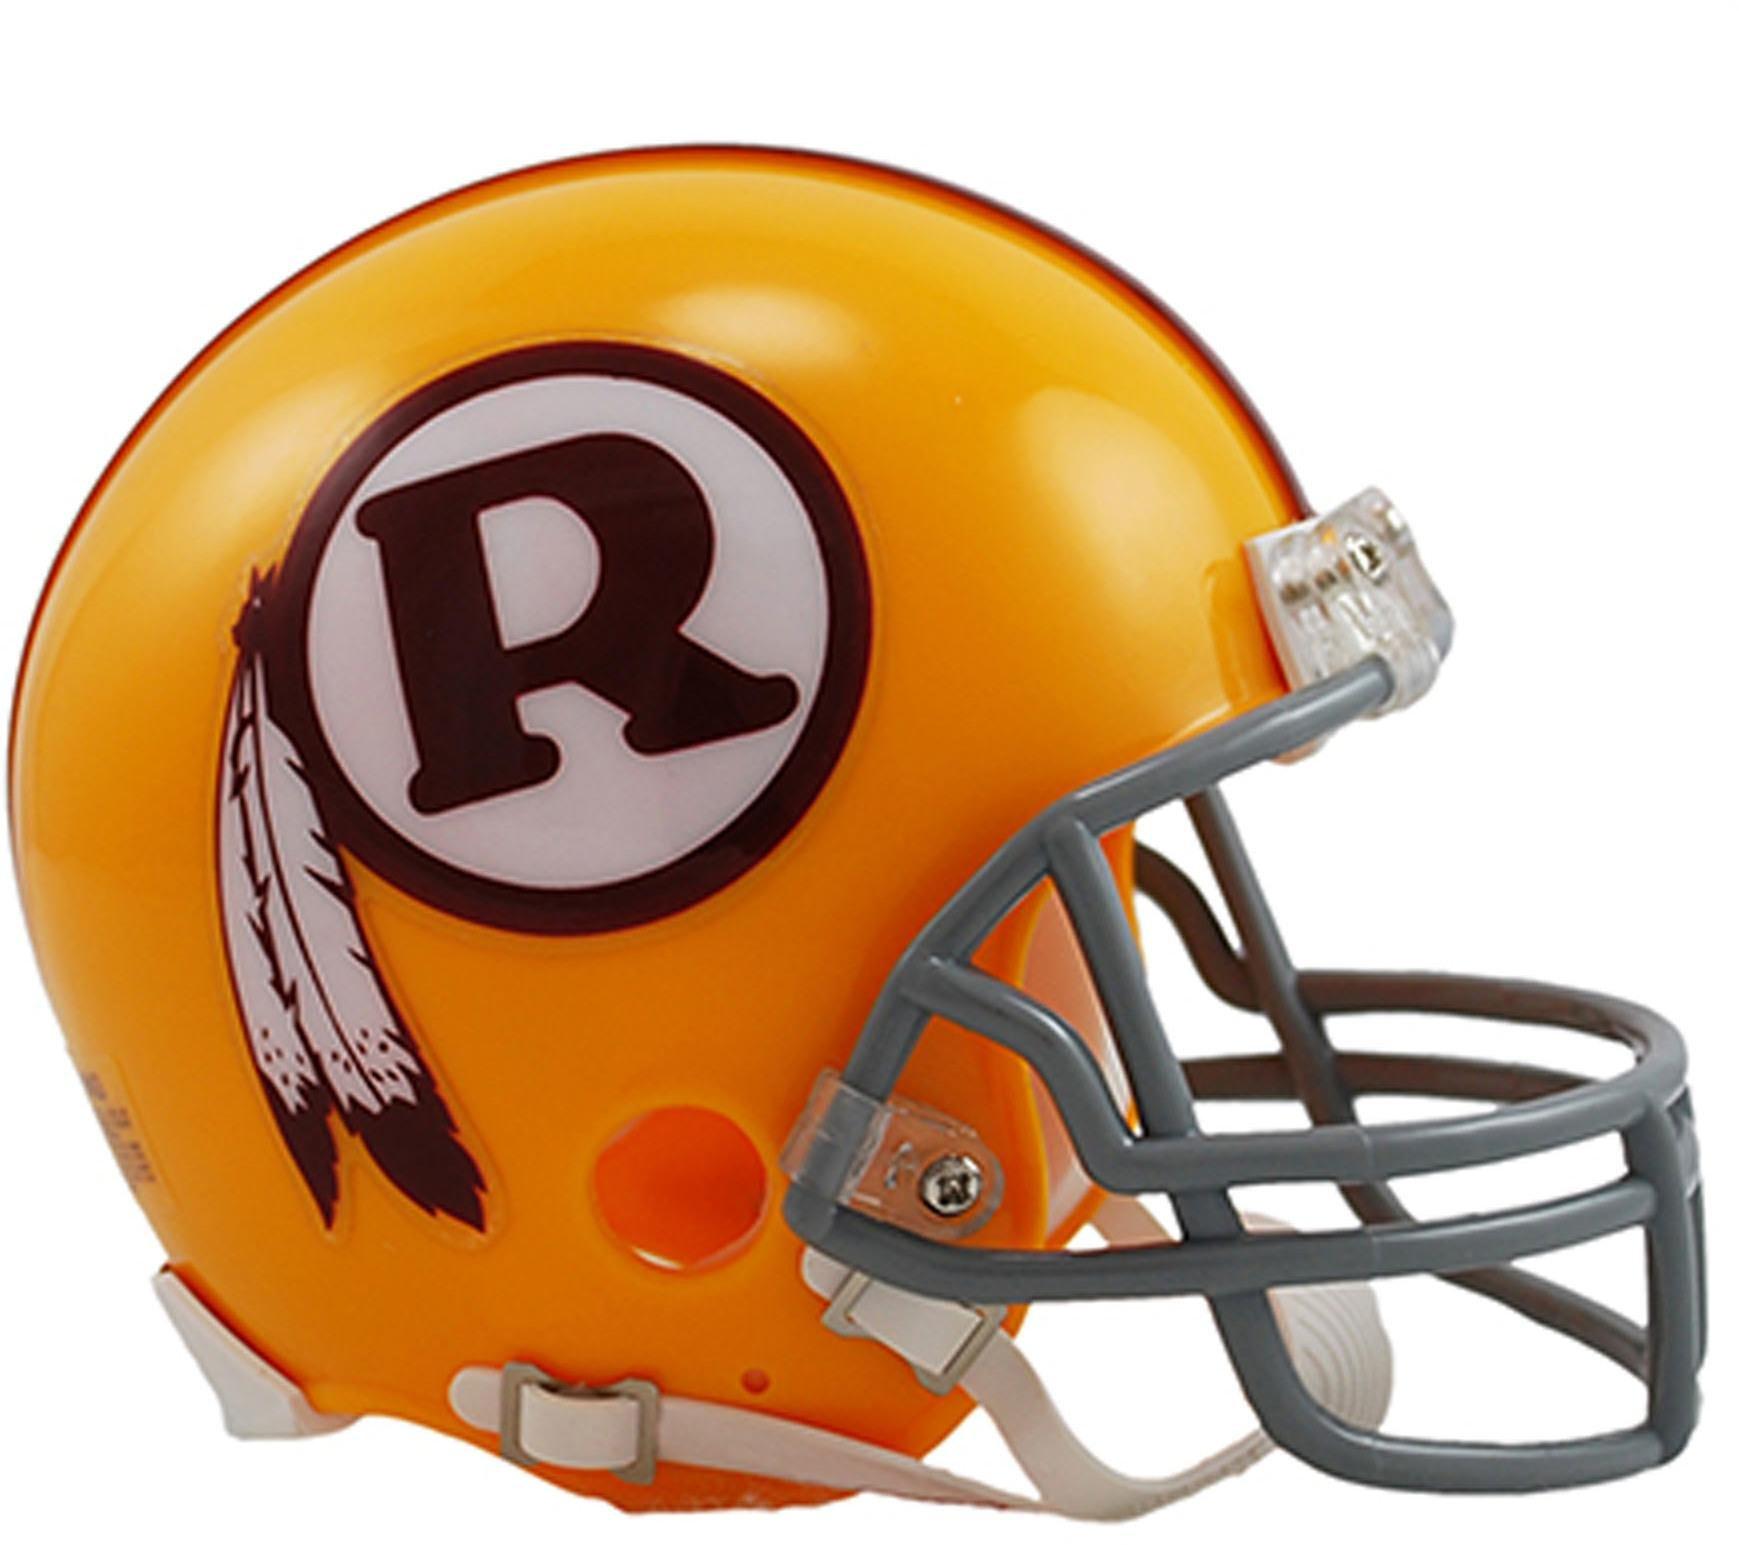 f64d53d1ff3 Sports Memorabilia Riddell Washington Redskins Throwback 1970-1971 VSR4  Mini Football Helmet - Fanatics Authentic